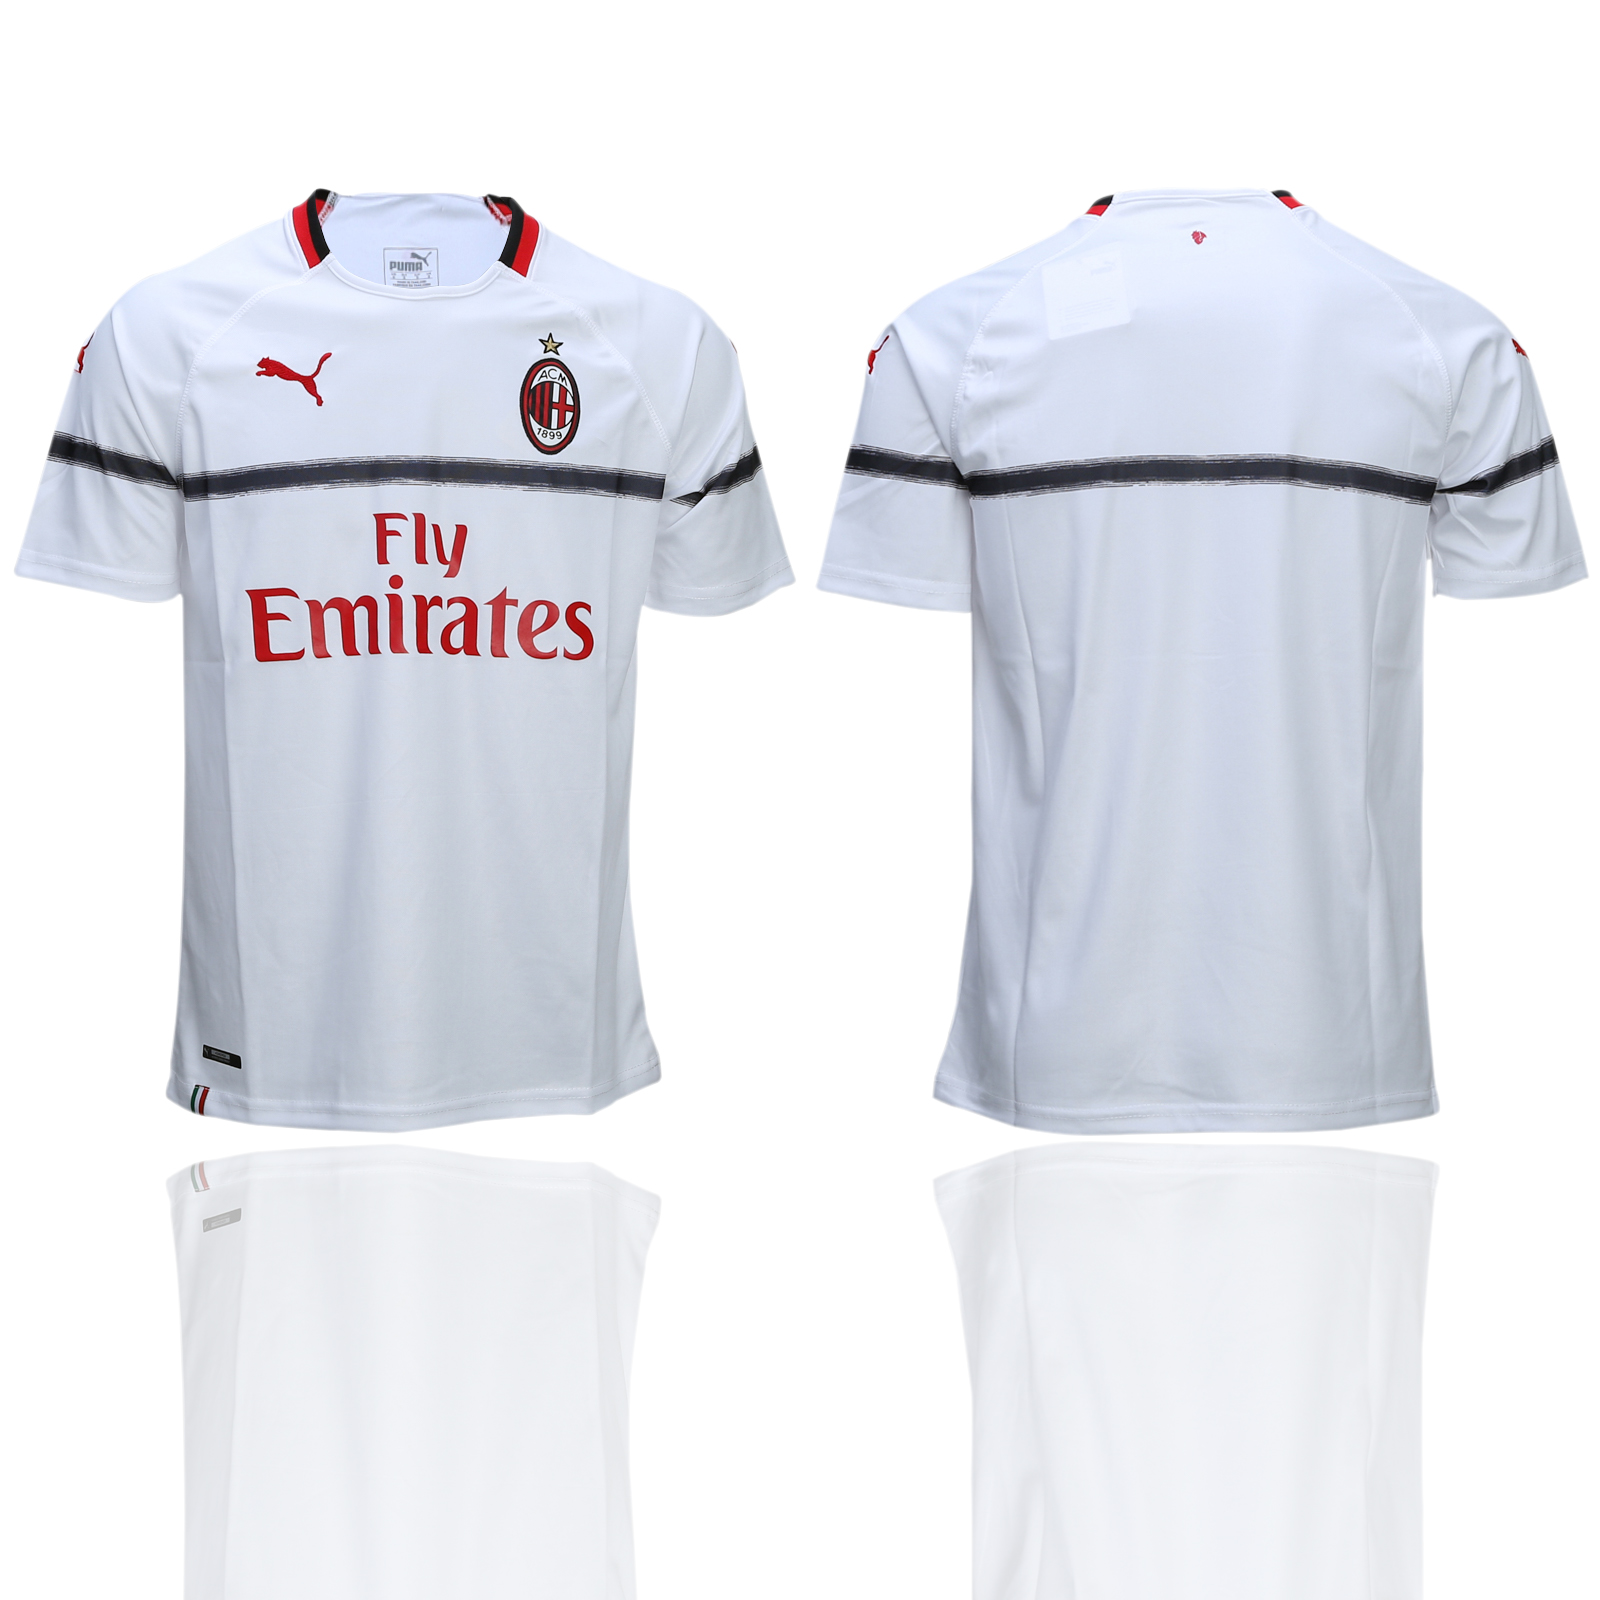 2018-19 AC Milan Away Thailand Soccer Jersey